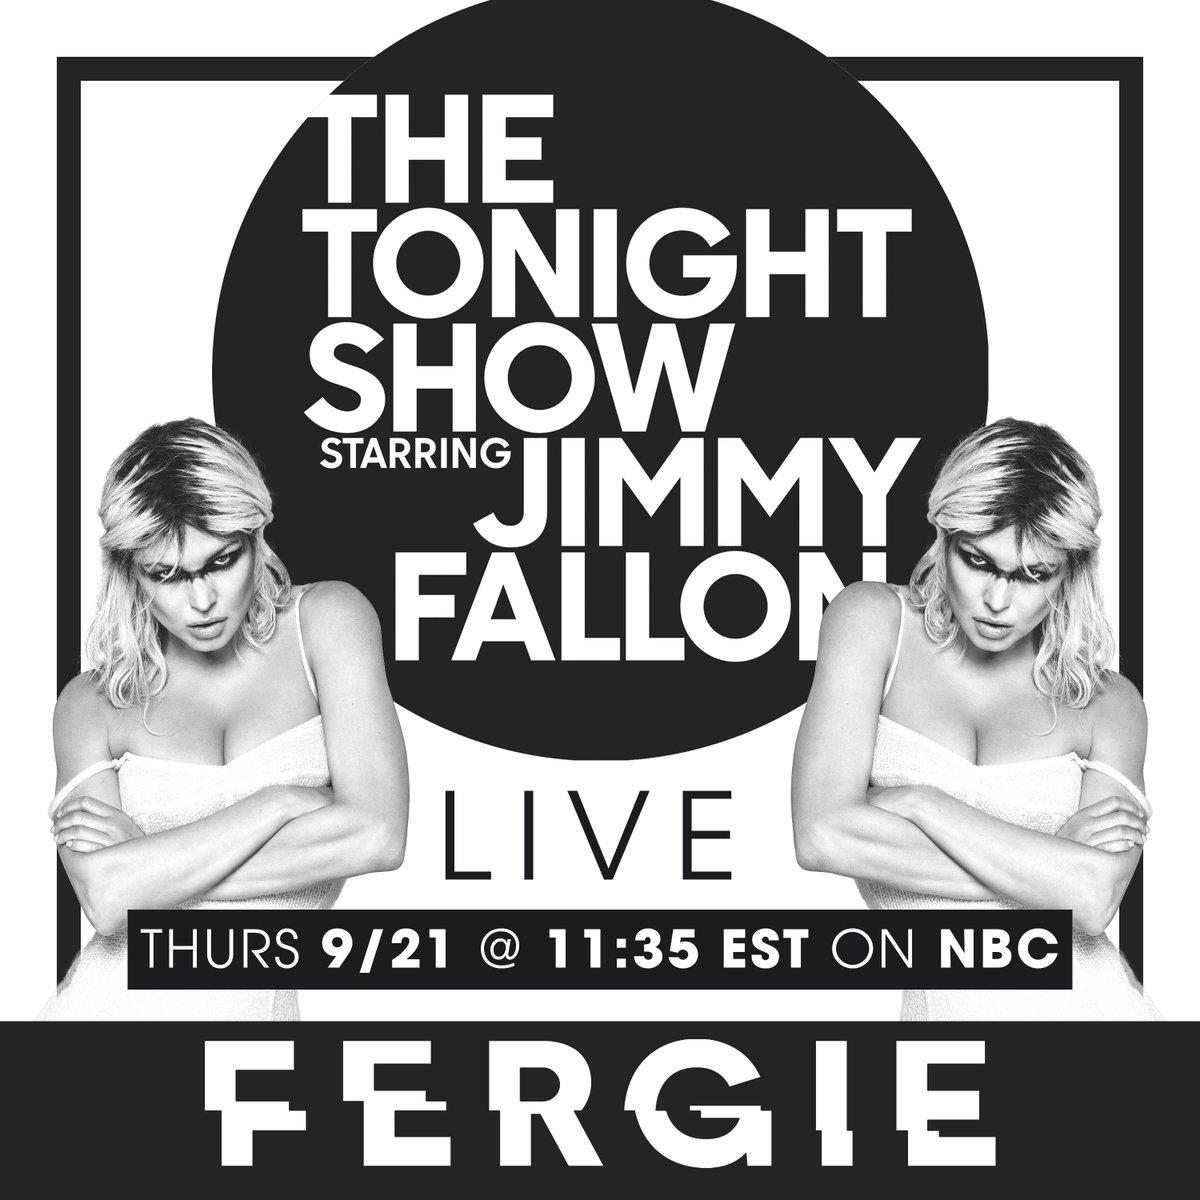 tomorrow!! @FallonTonight ???????? https://t.co/245HxslXZk